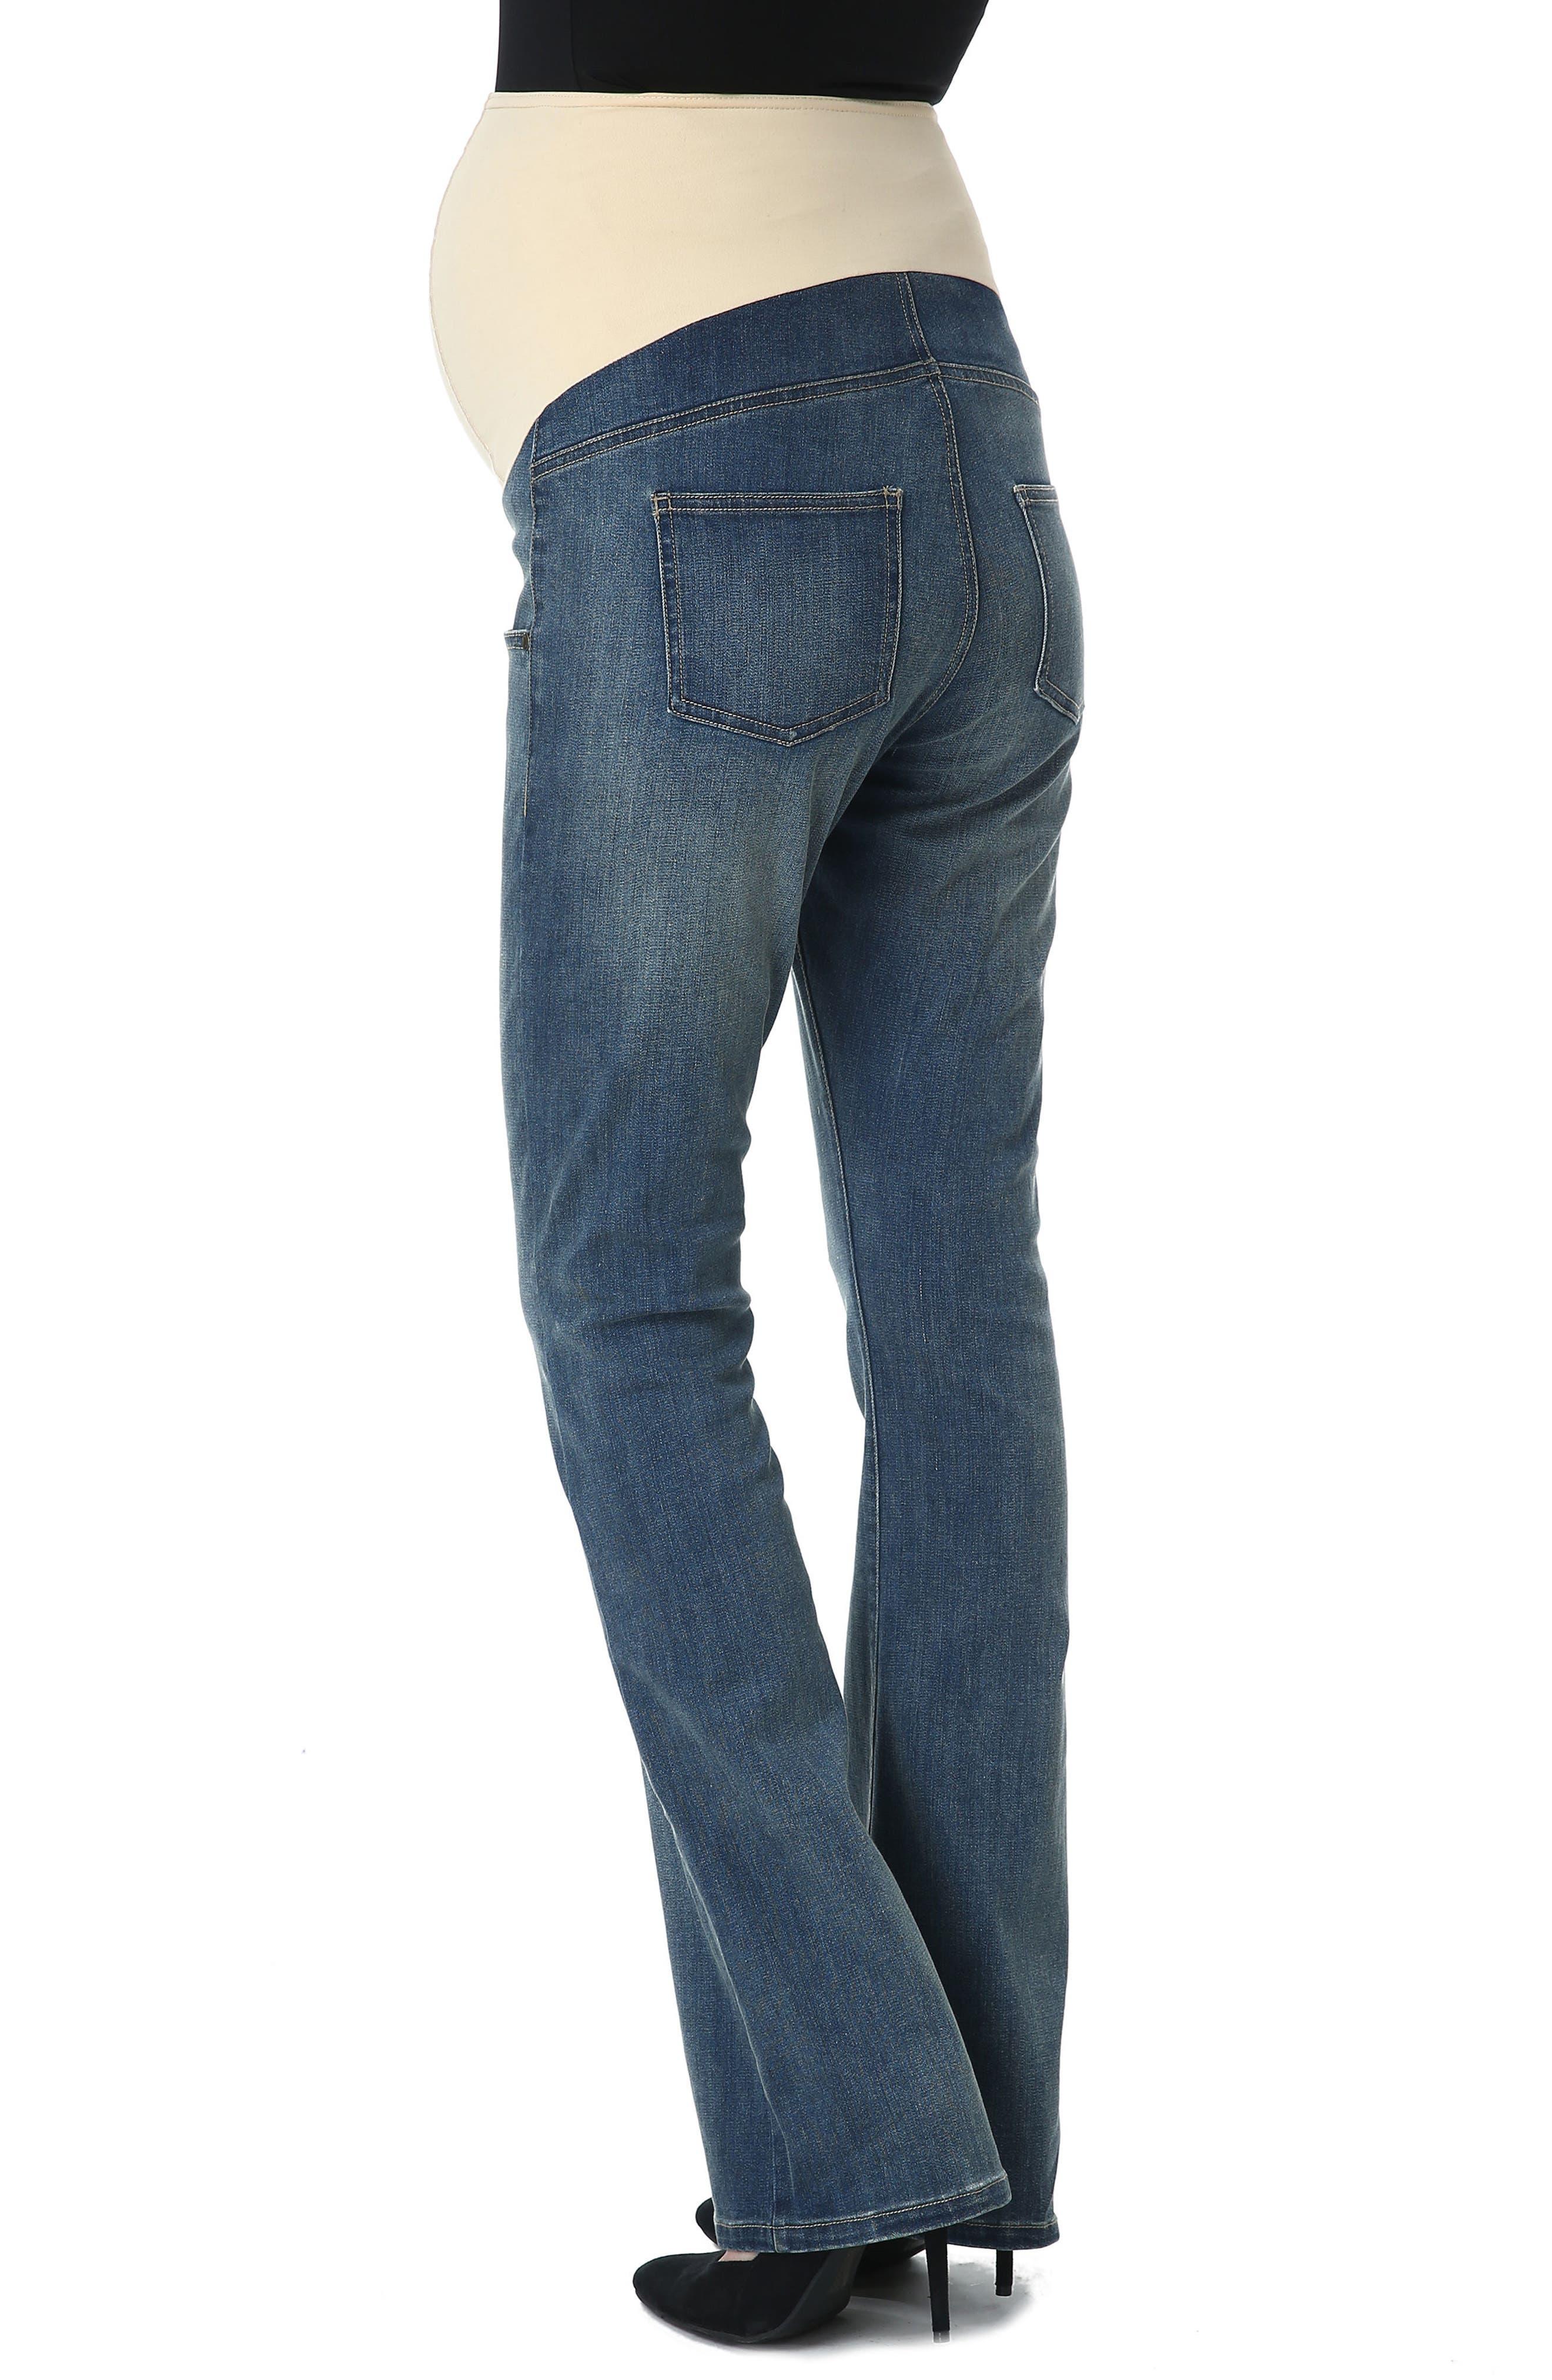 Dixie Maternity Flare Jeans,                             Alternate thumbnail 2, color,                             Medium Indigo